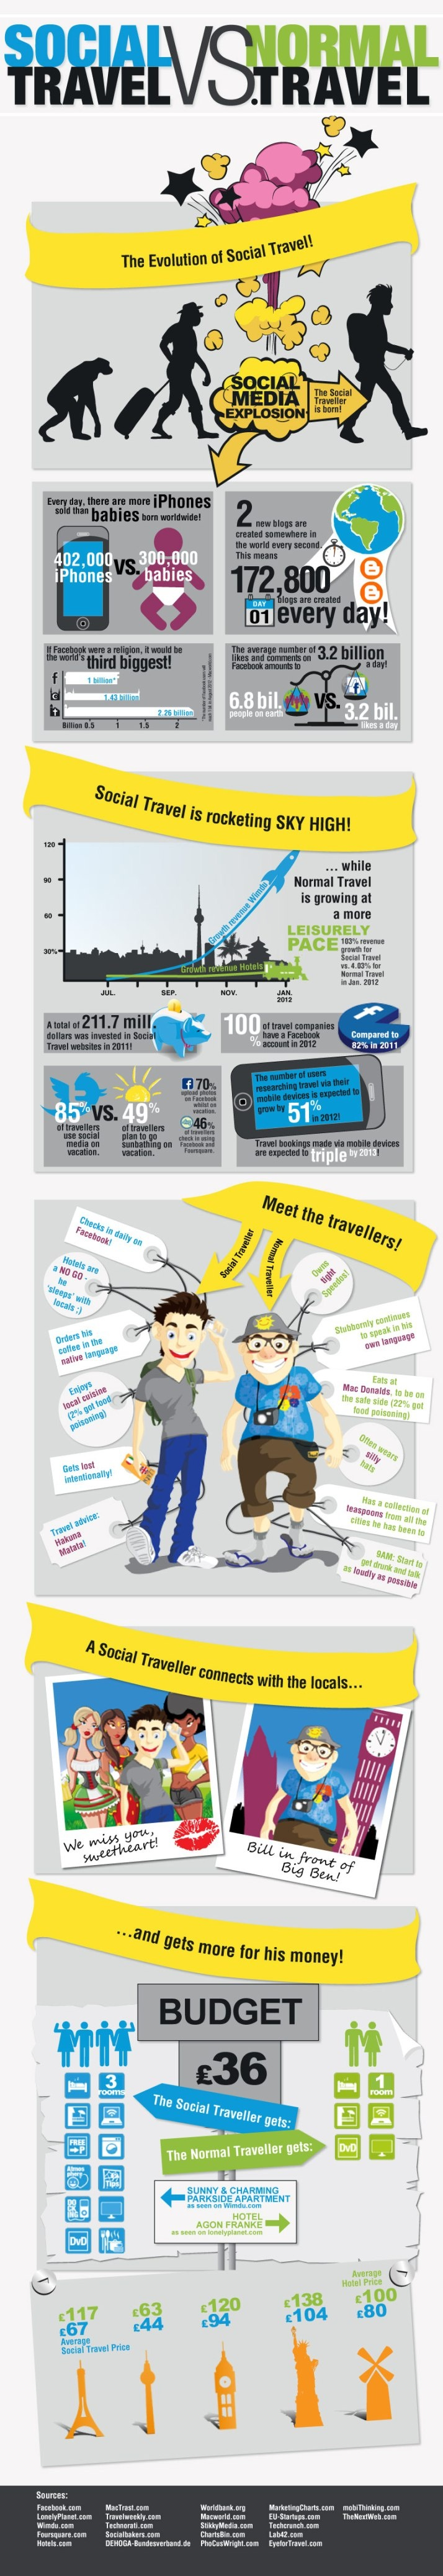 Viajero Social vs viajero tradicional #infografia #infographic #socialmedia #tourism